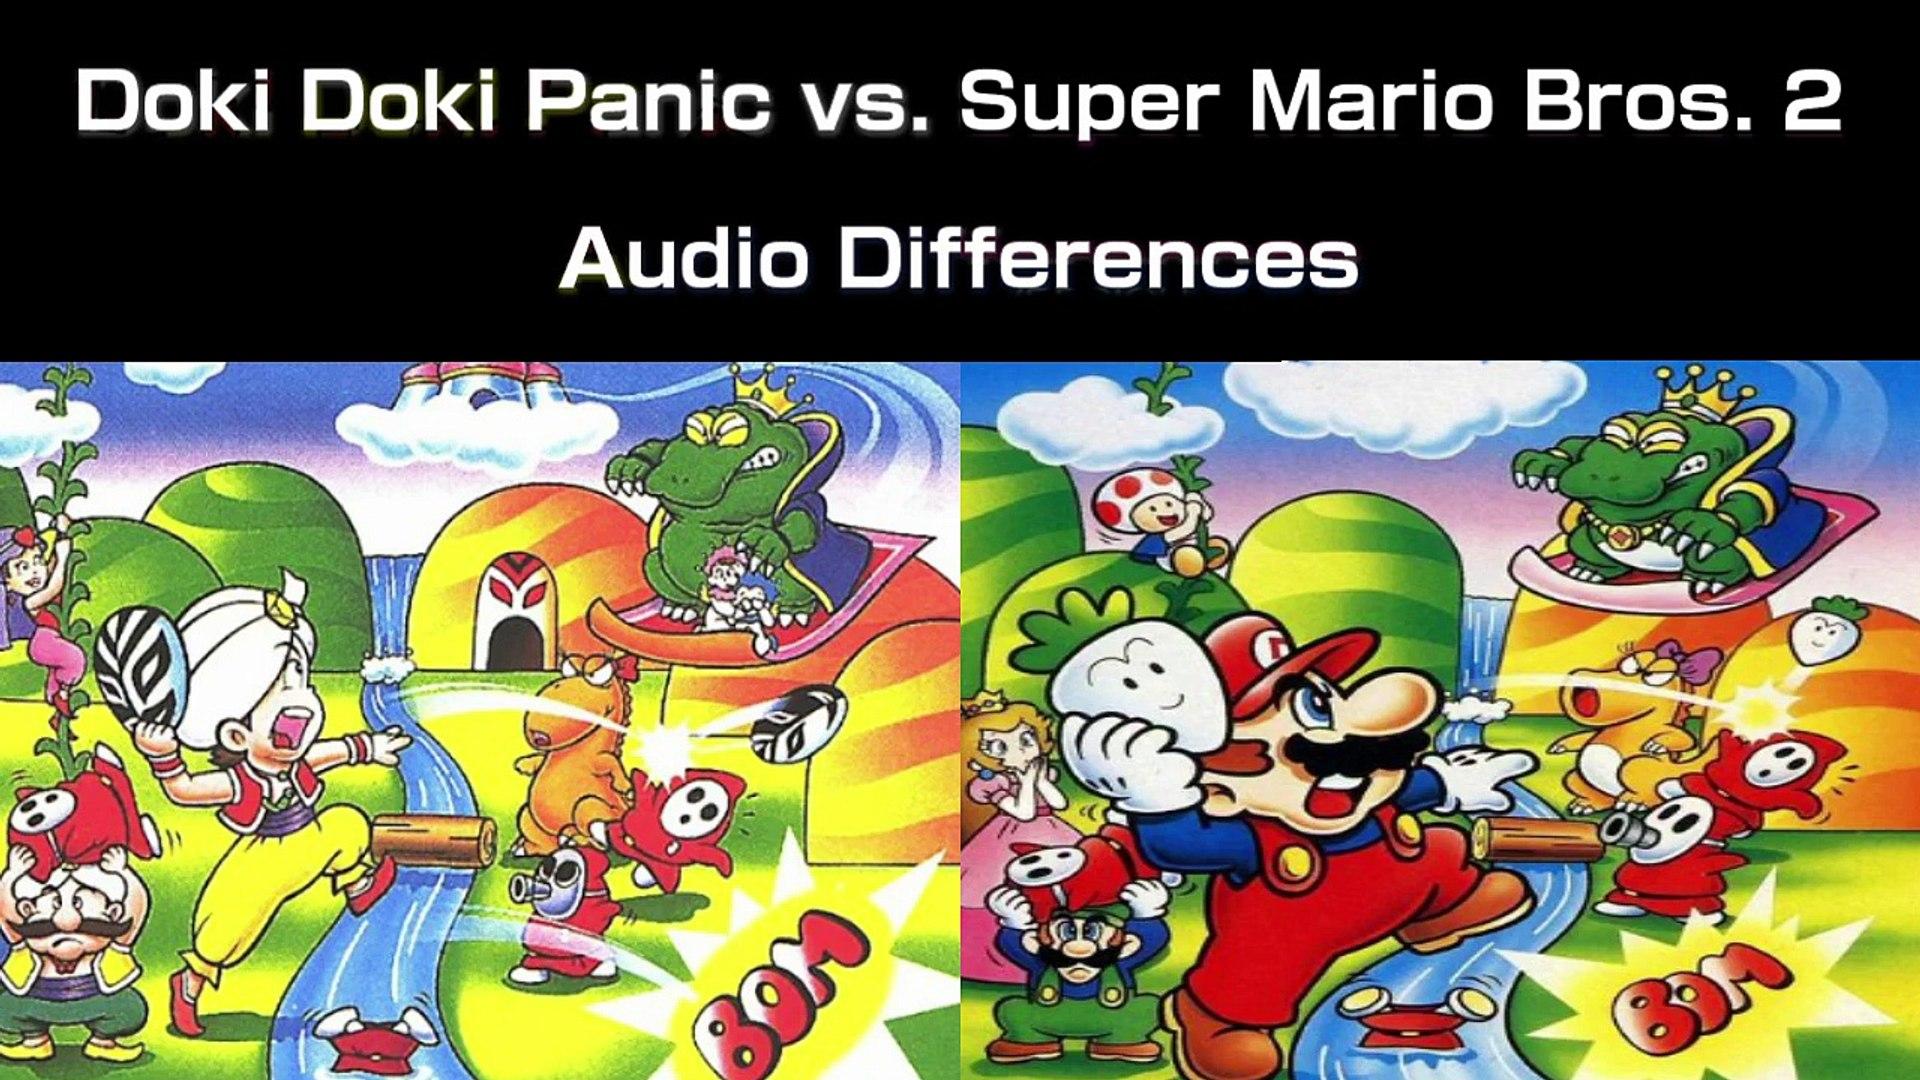 Audio Differences- Doki Doki Panic vs  Super Mario Bros  2